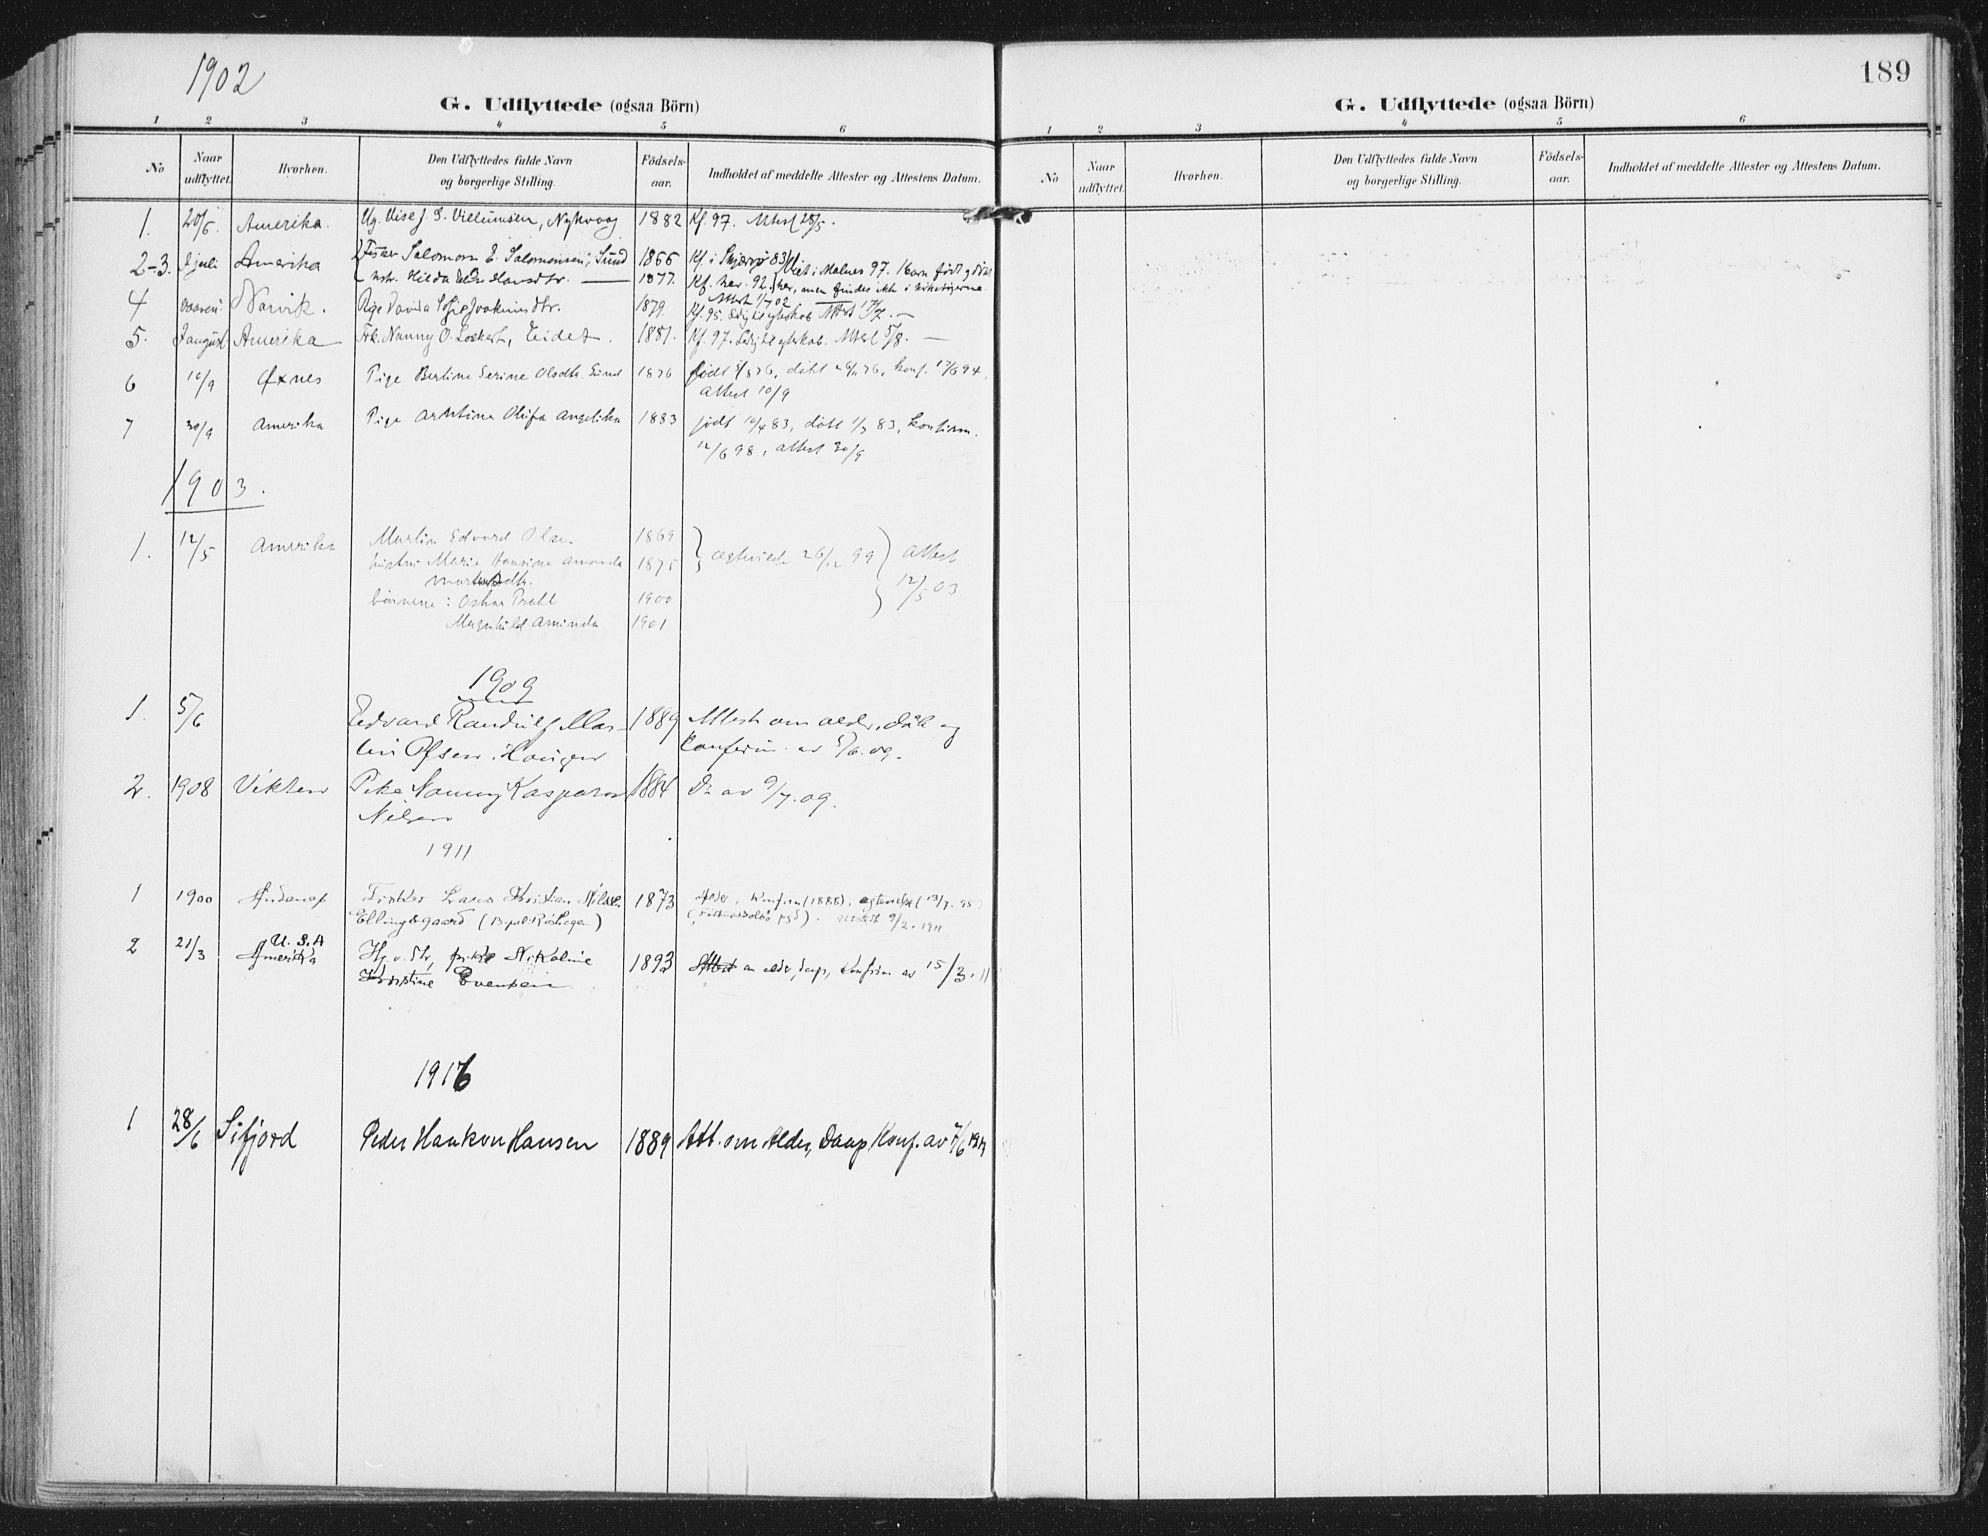 SAT, Ministerialprotokoller, klokkerbøker og fødselsregistre - Nordland, 892/L1321: Ministerialbok nr. 892A02, 1902-1918, s. 189